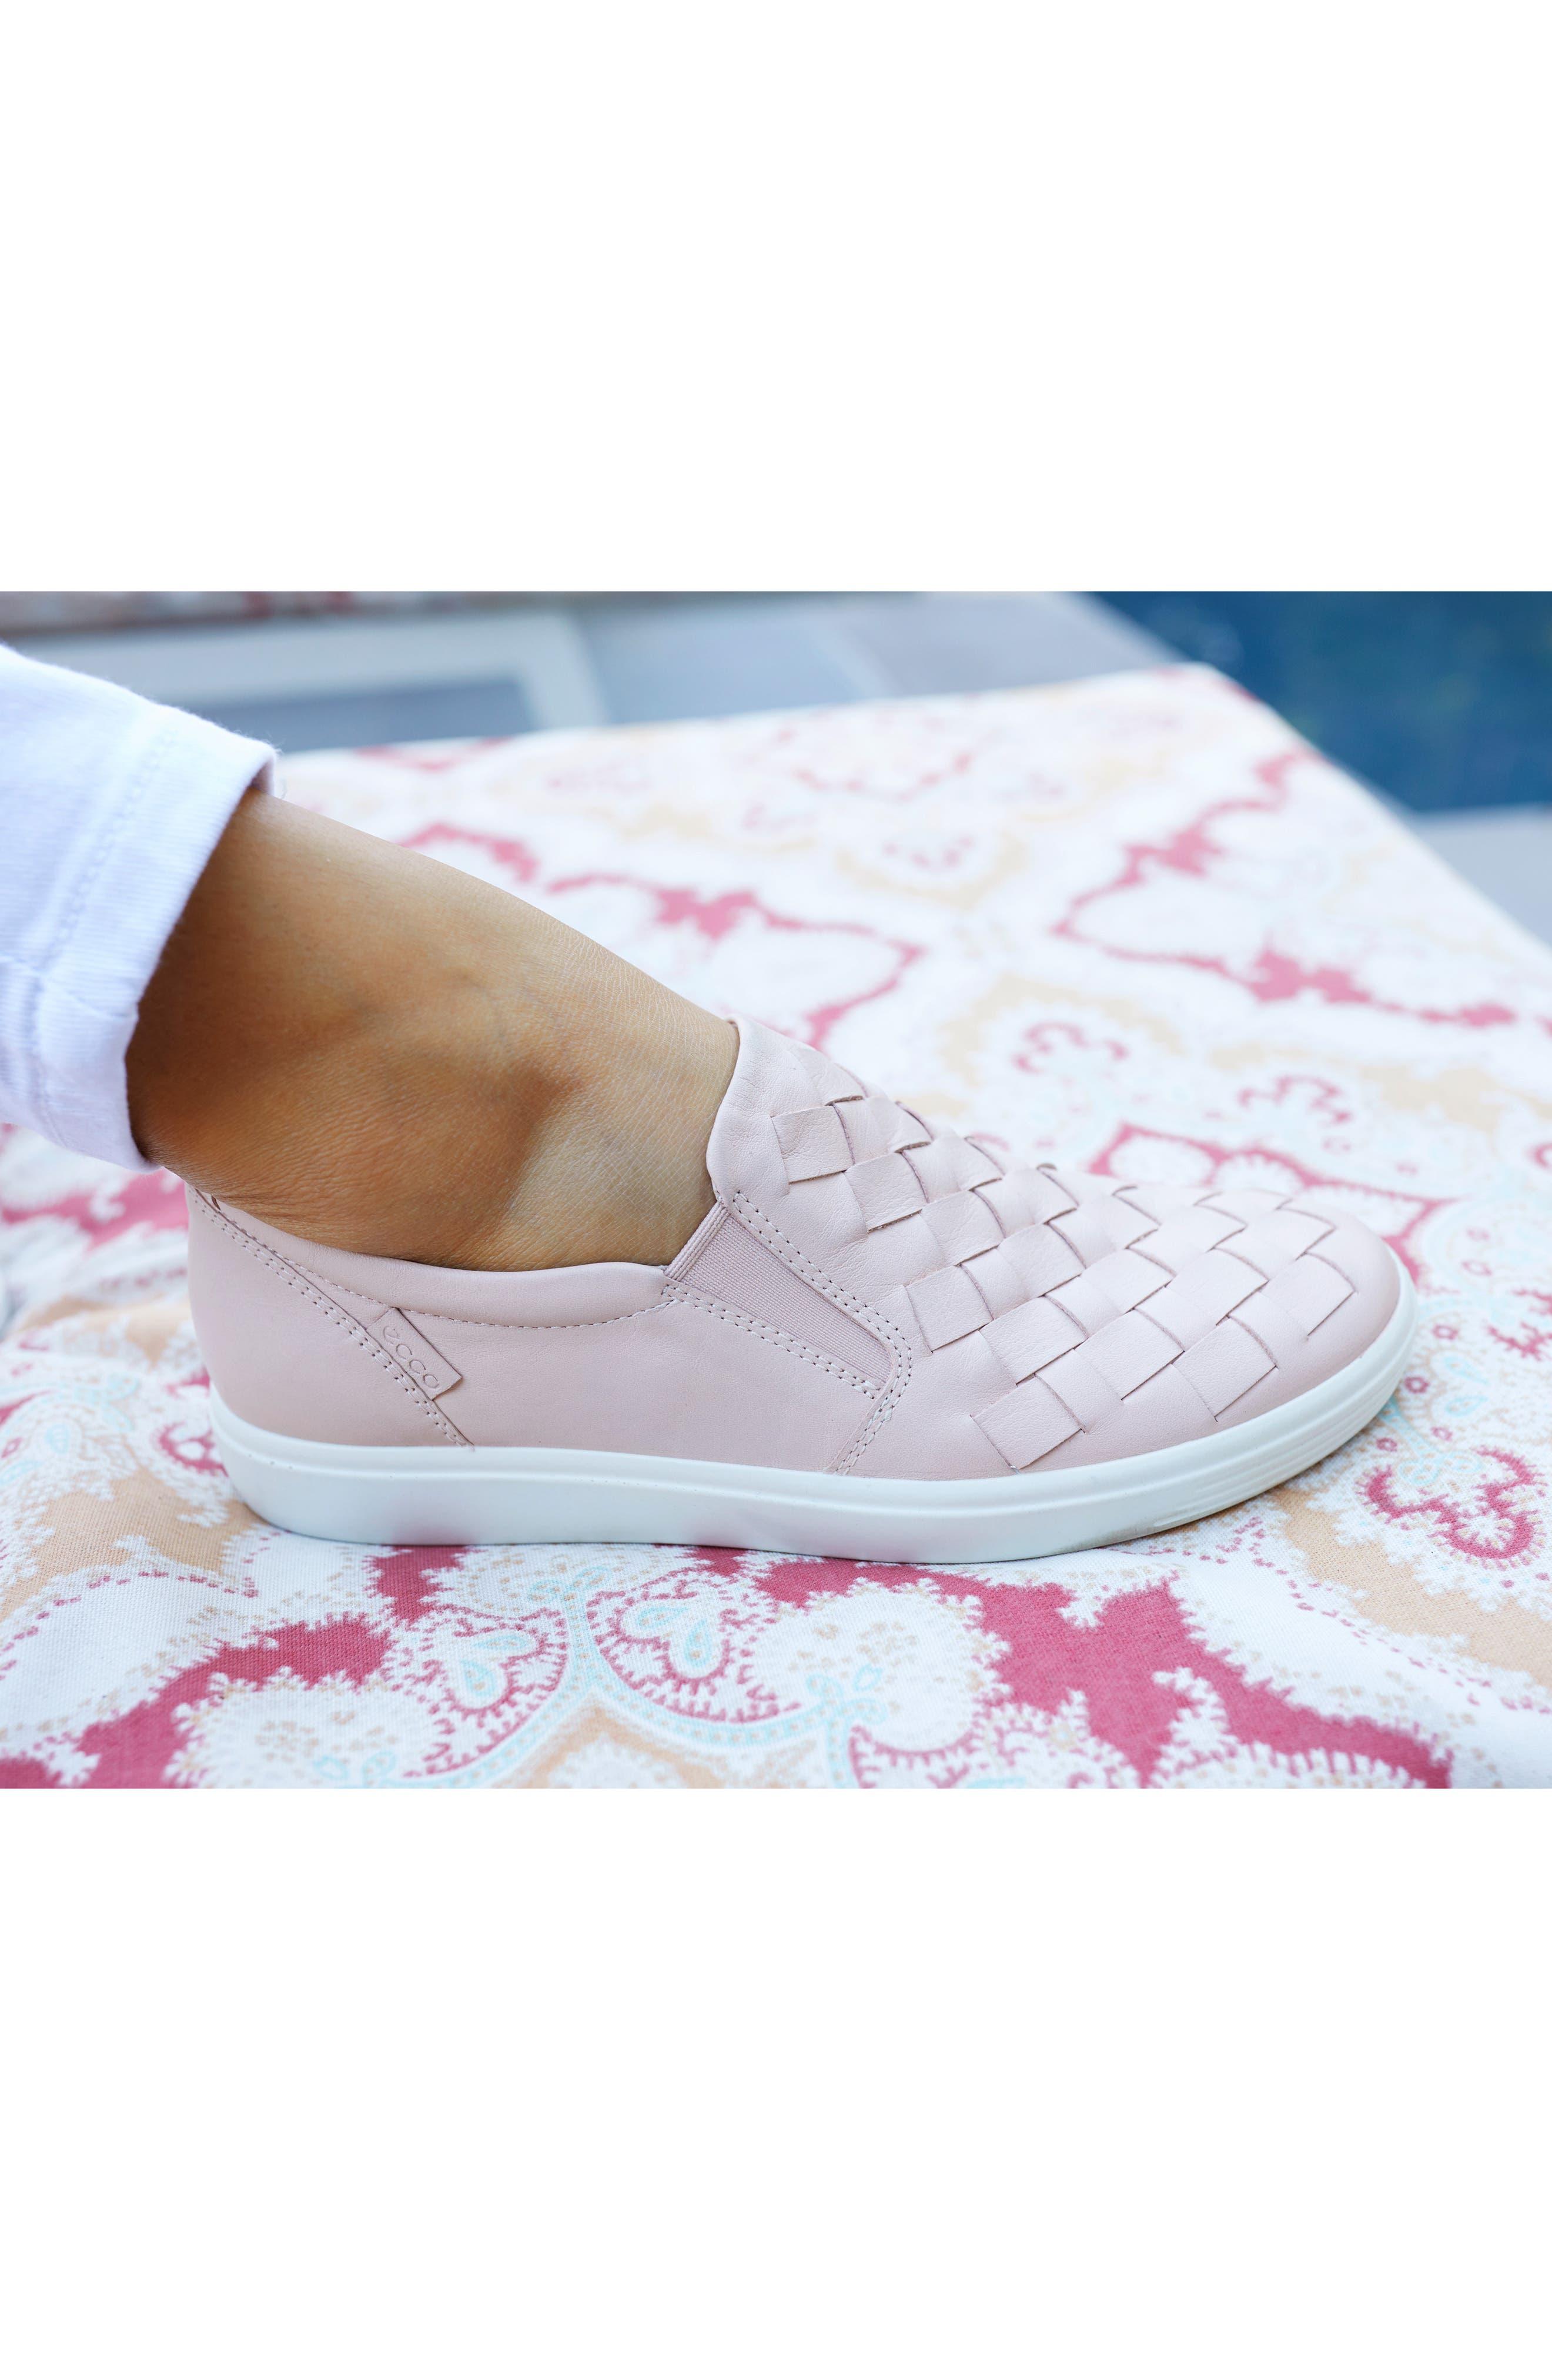 ECCO, Soft 7 Woven Slip-On Sneaker, Alternate thumbnail 7, color, ROSE DUST LEATHER